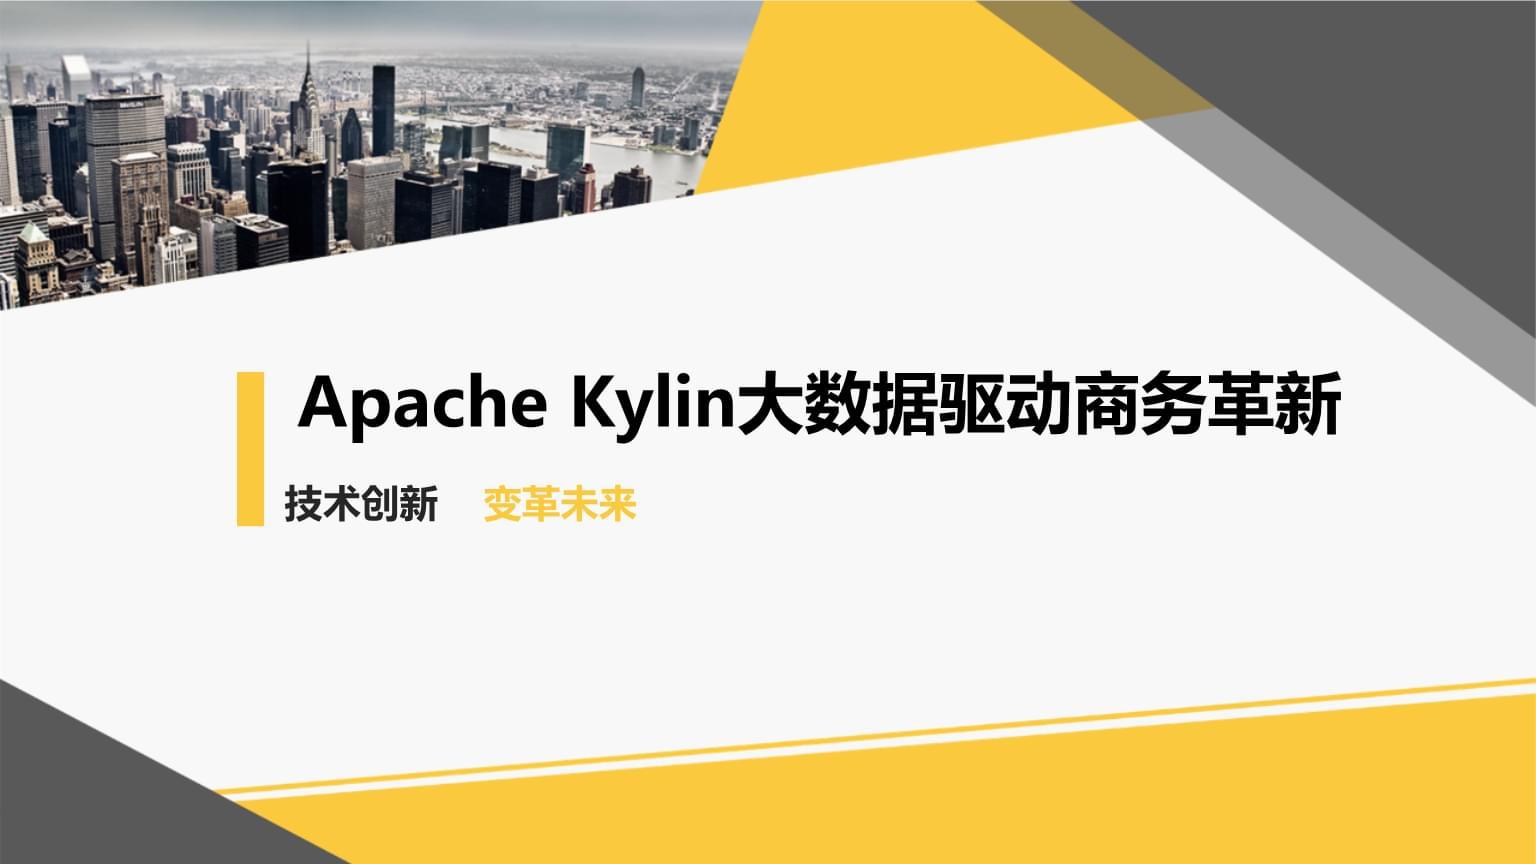 Apache Kylin大数据驱动商务革新.pptx